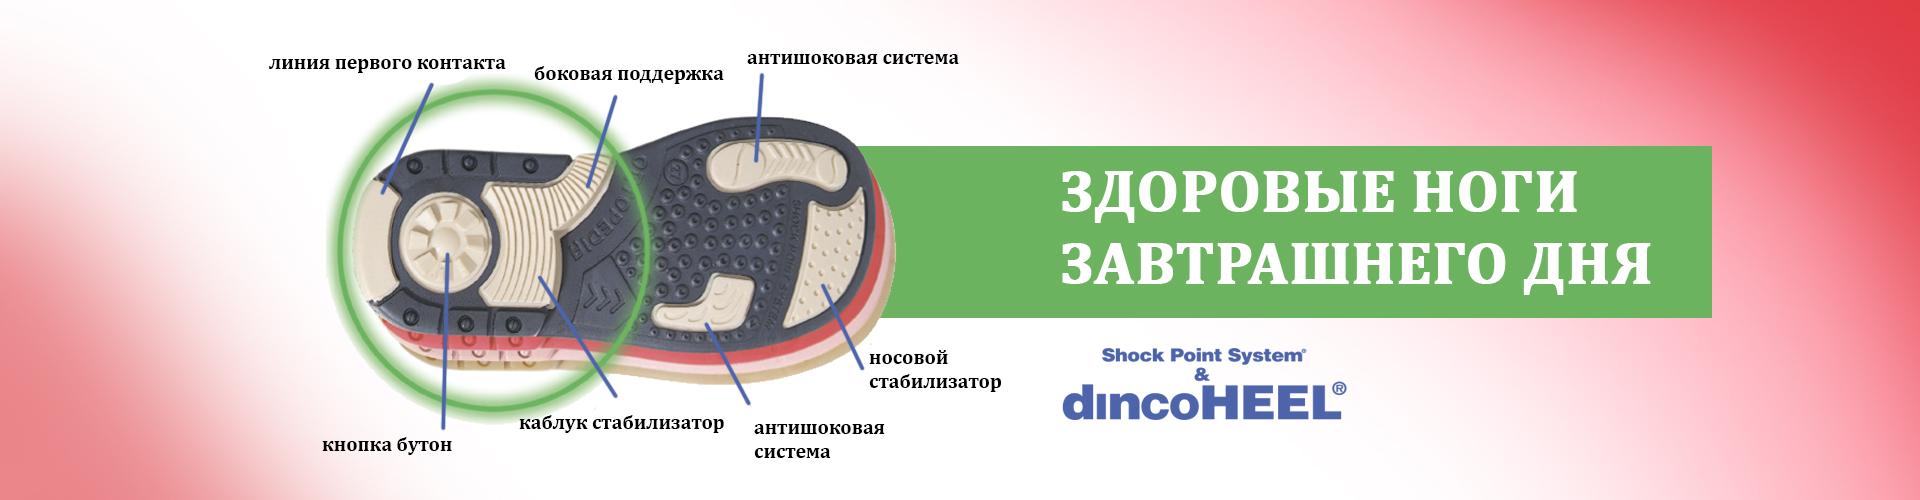 b114bb3bf Интернет-магазин детской обуви Bravelli KIDS (Ortopedia®)